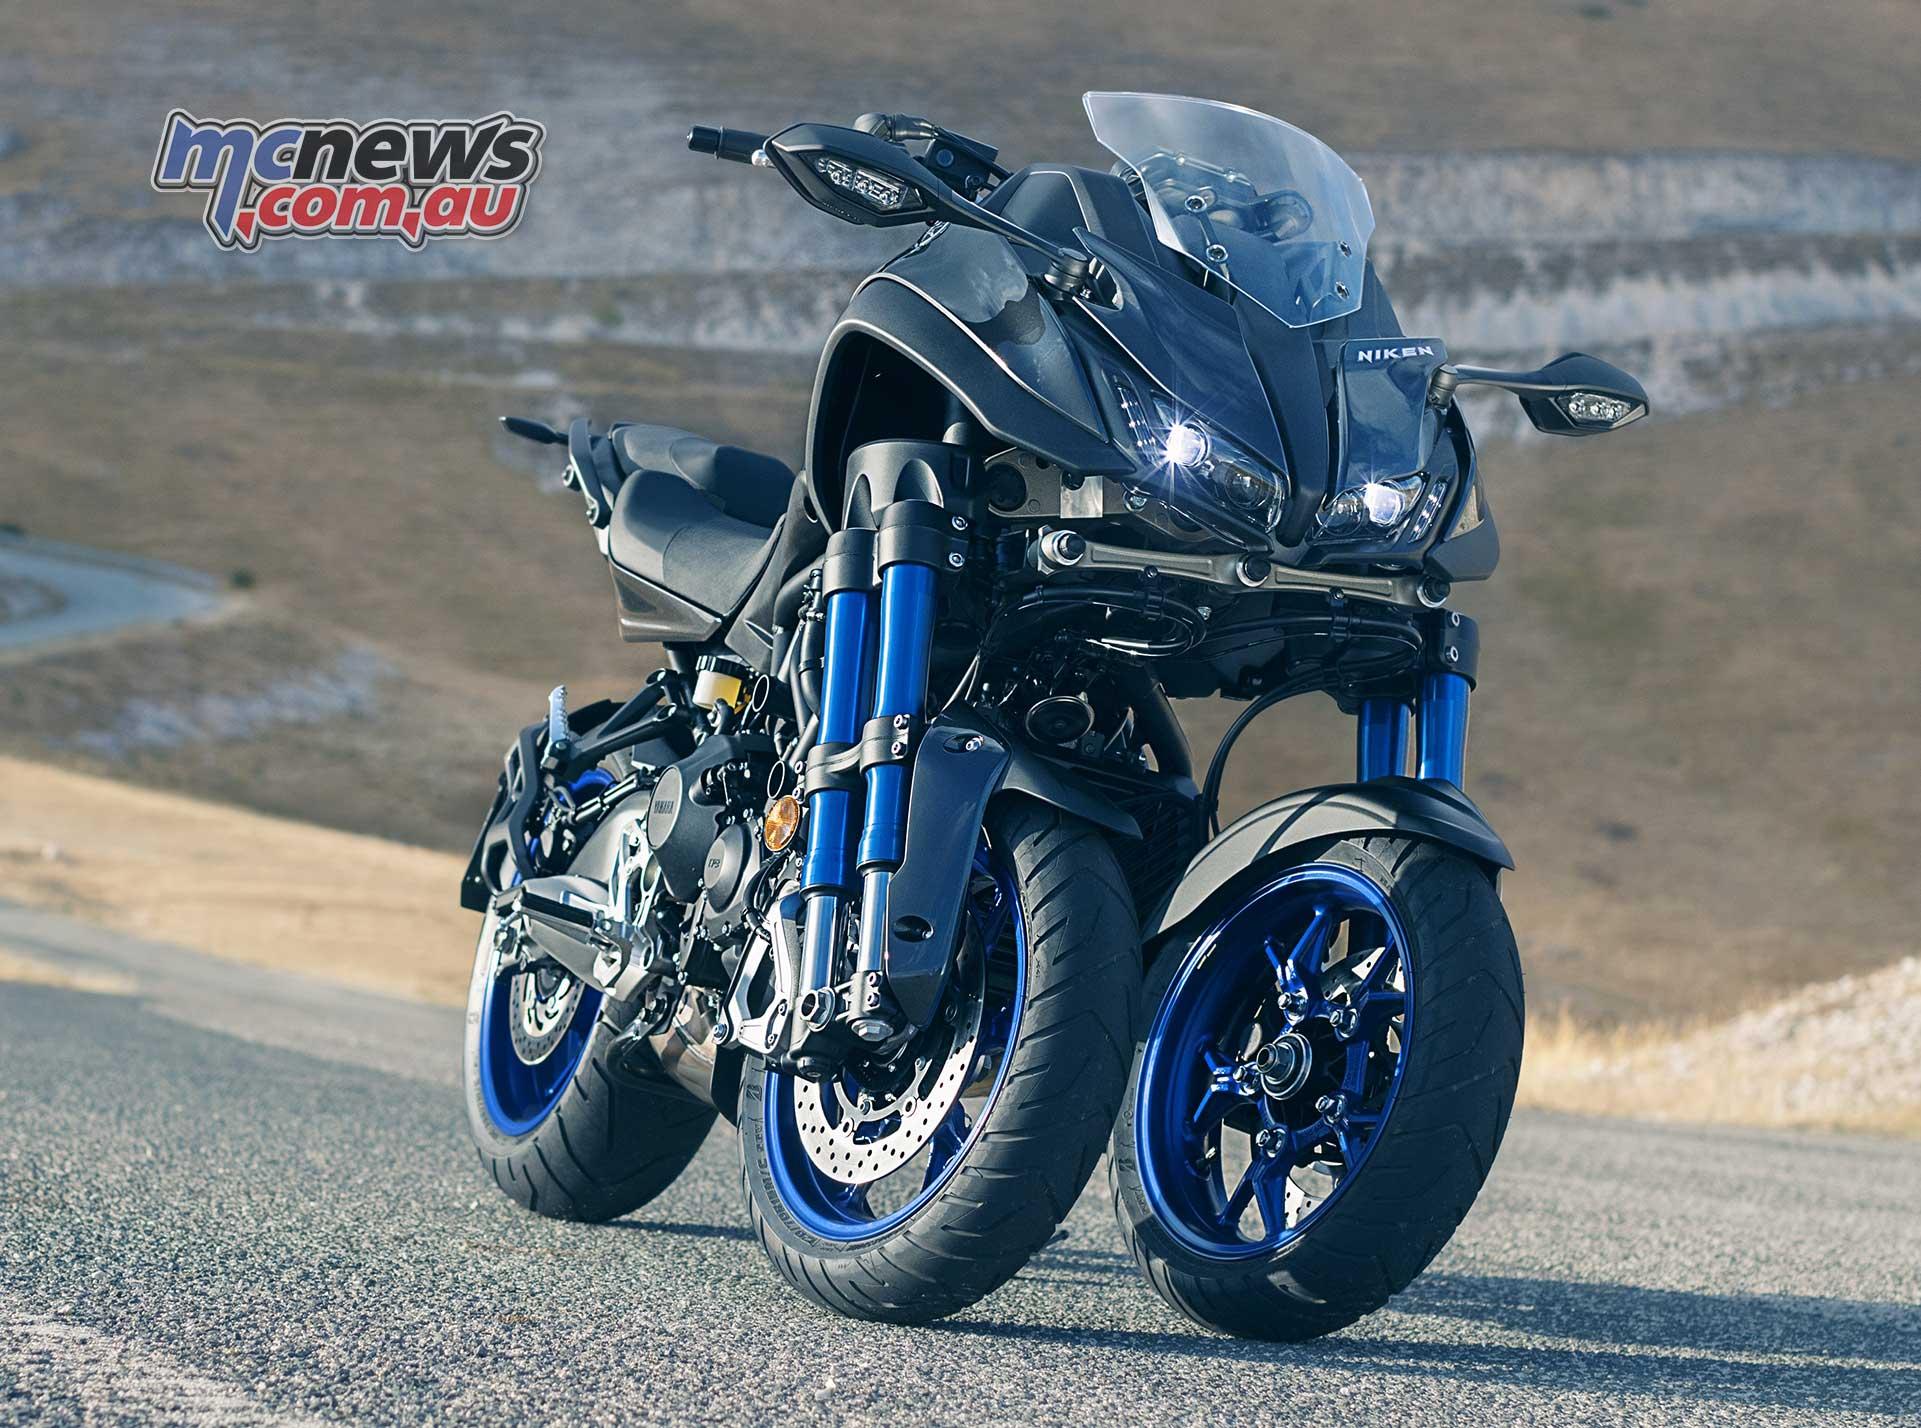 MT-09 powered trike from Yamaha | MTX850 Niken | MCNews.com.au